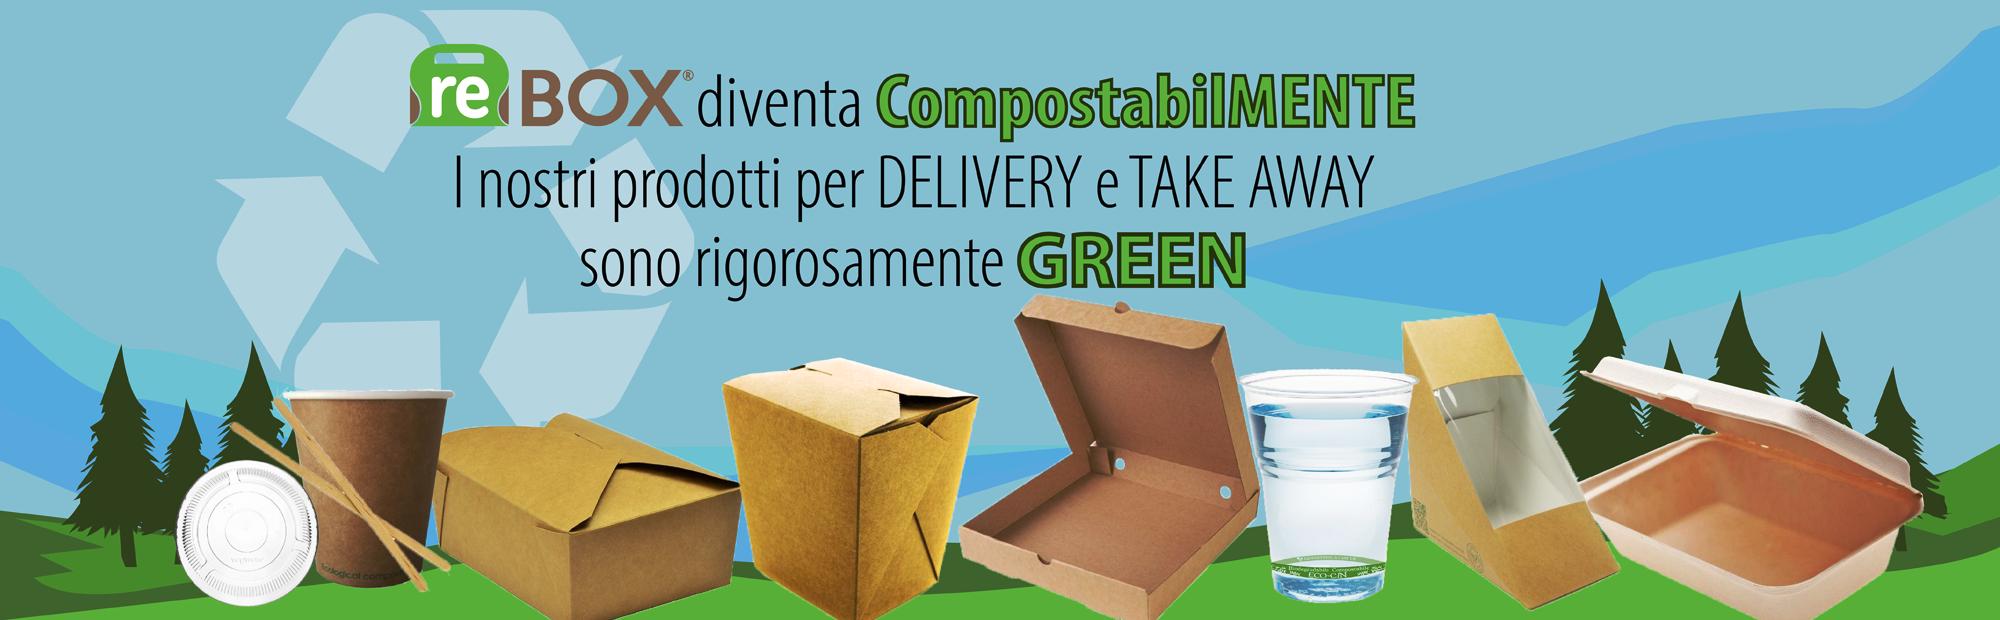 Asporto GREEN